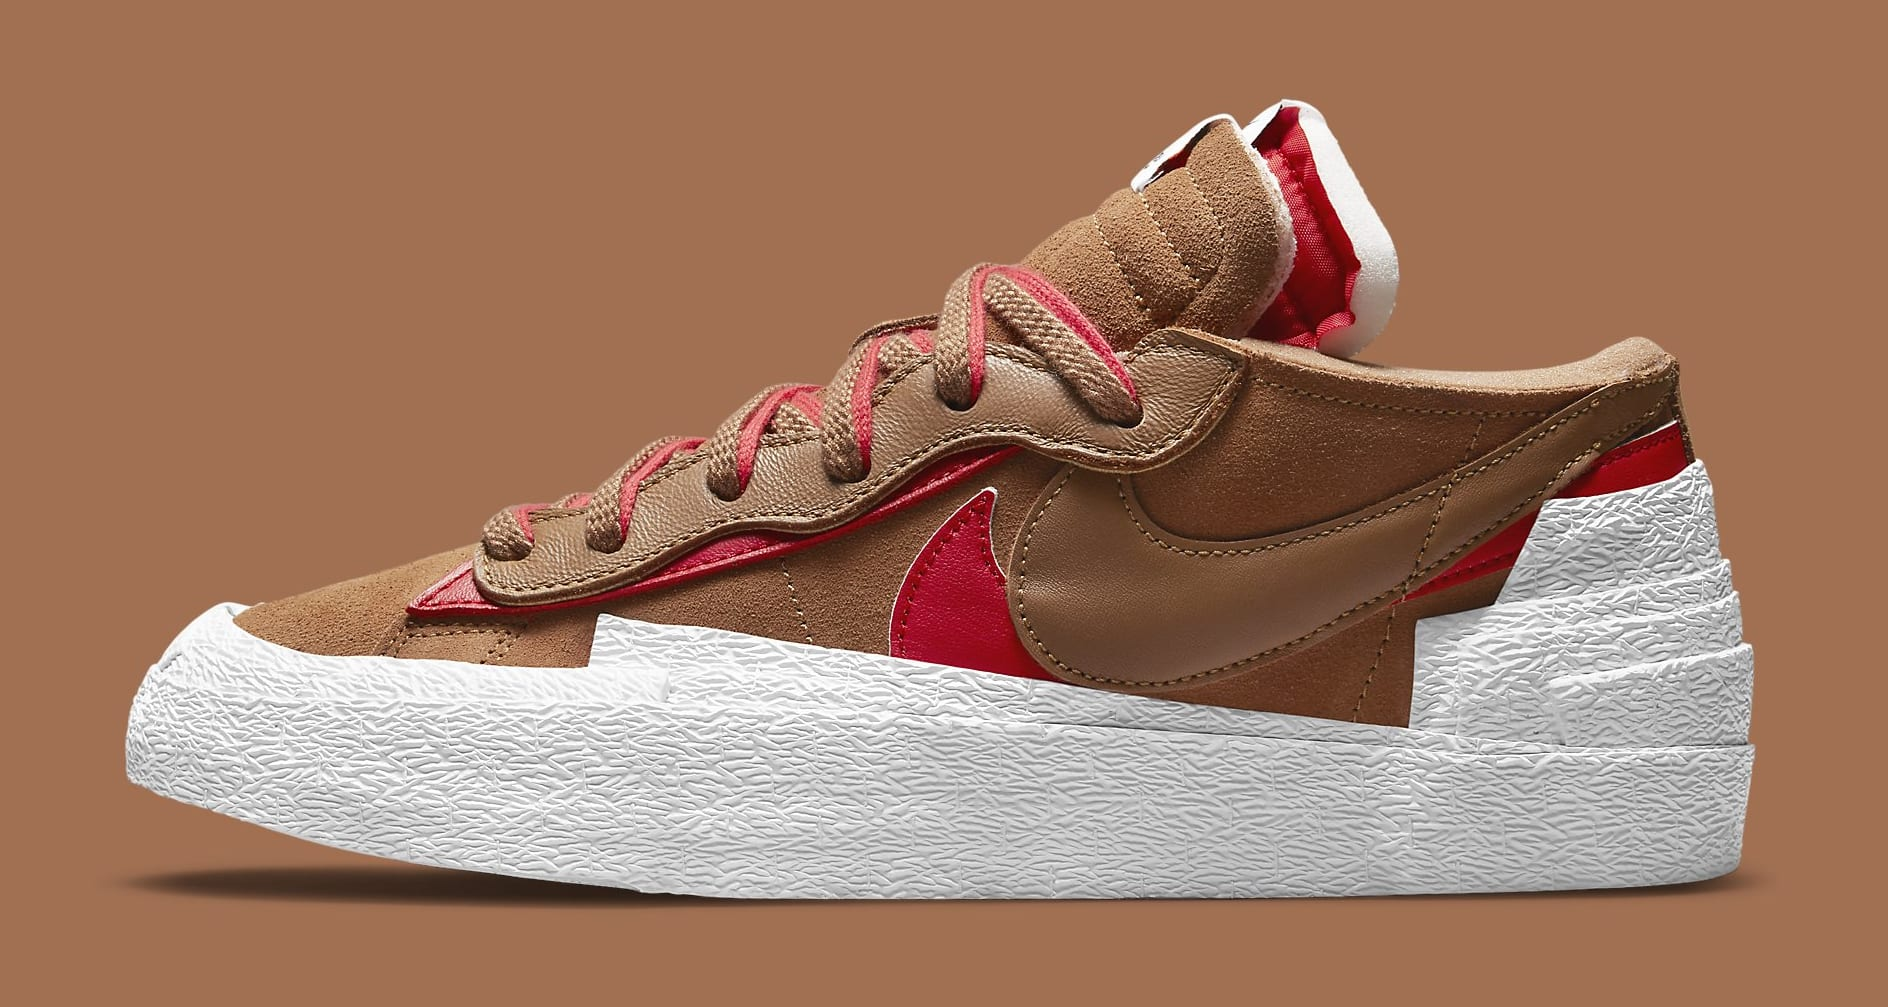 Sacai x Nike Blazer Low 'British Tan' DD1877-200 Lateral